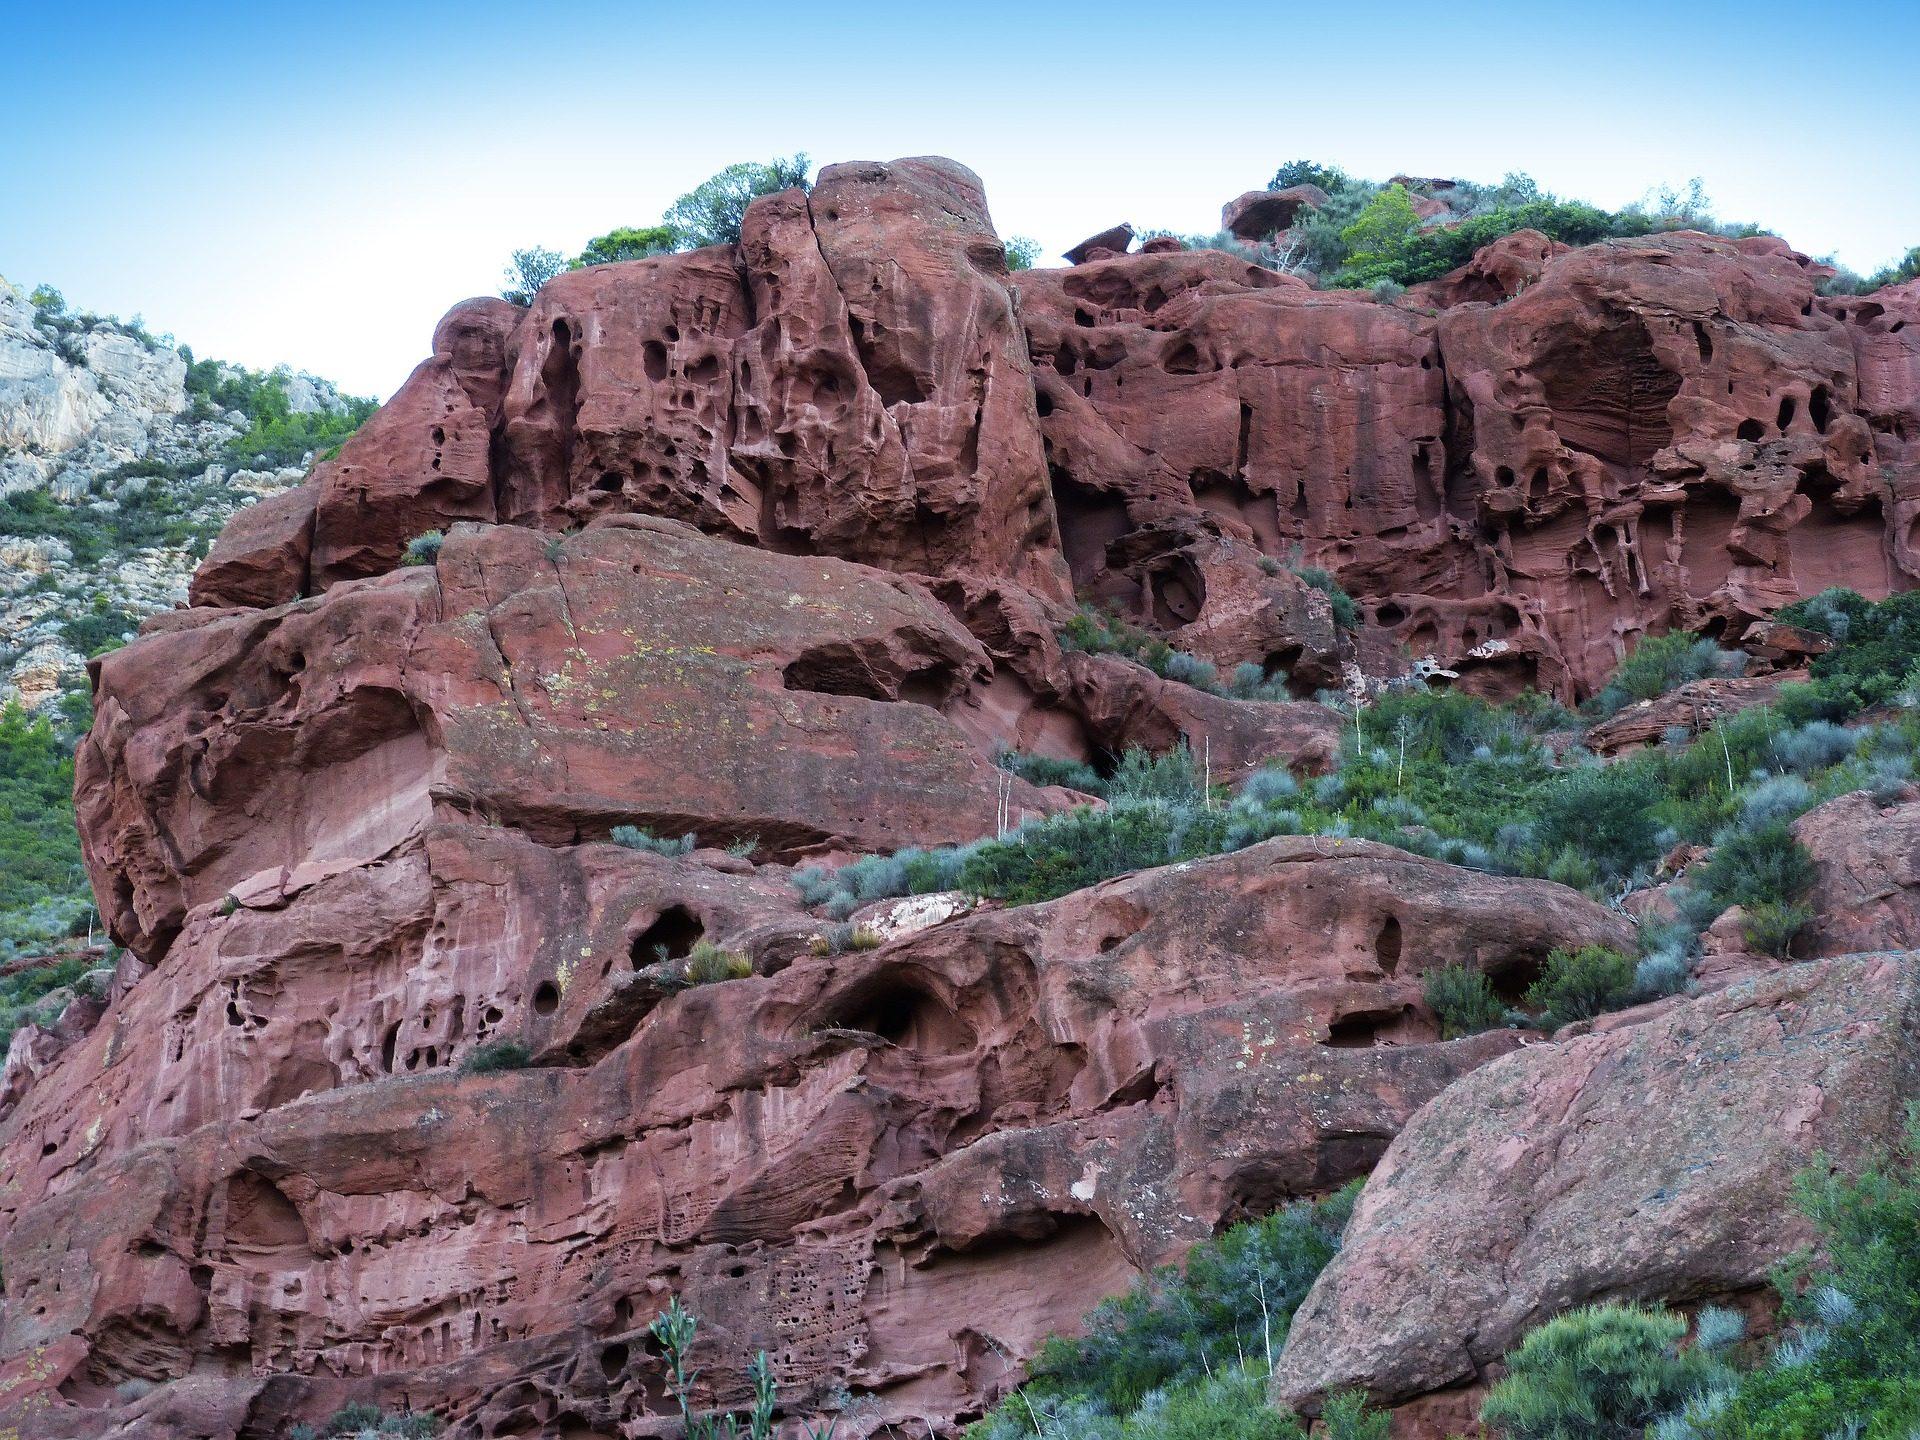 पहाड़, पत्थर, Rocas, कटाव, cavities, गुफाओं - HD वॉलपेपर - प्रोफेसर-falken.com